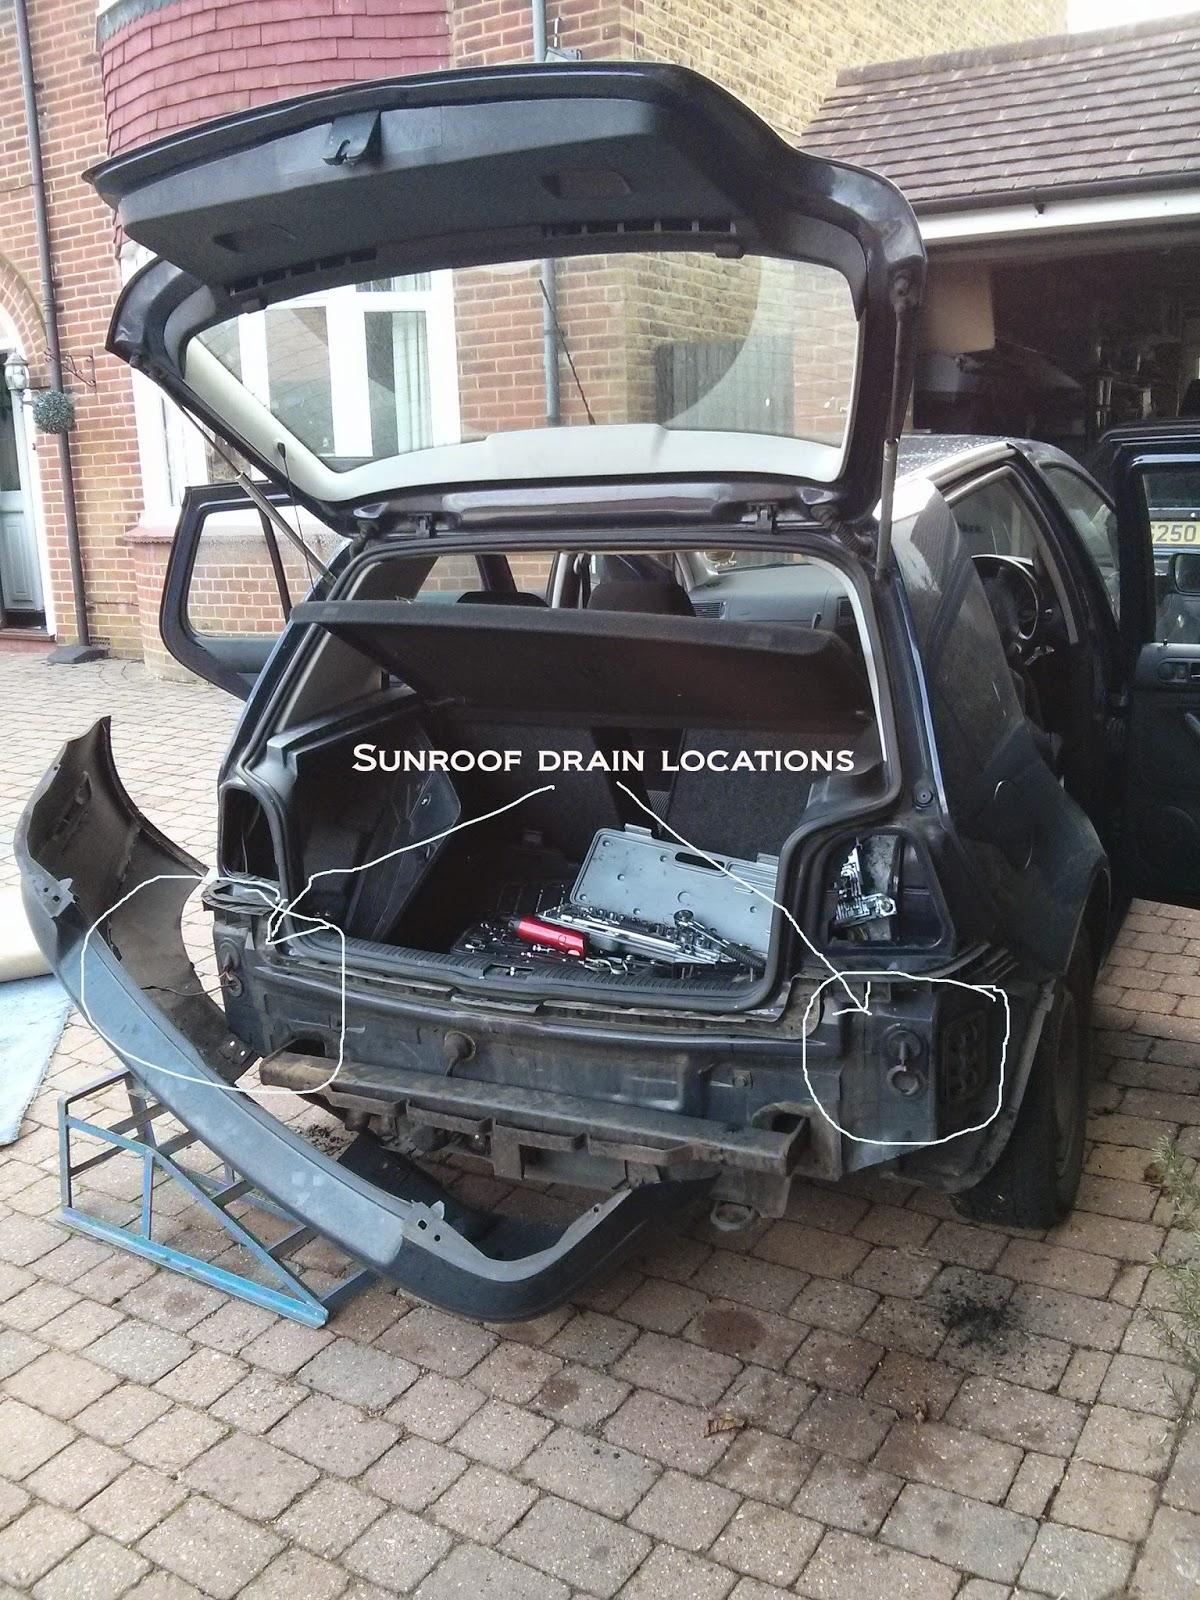 VW Golf Sunroof Leaking - Drain Hole Locations